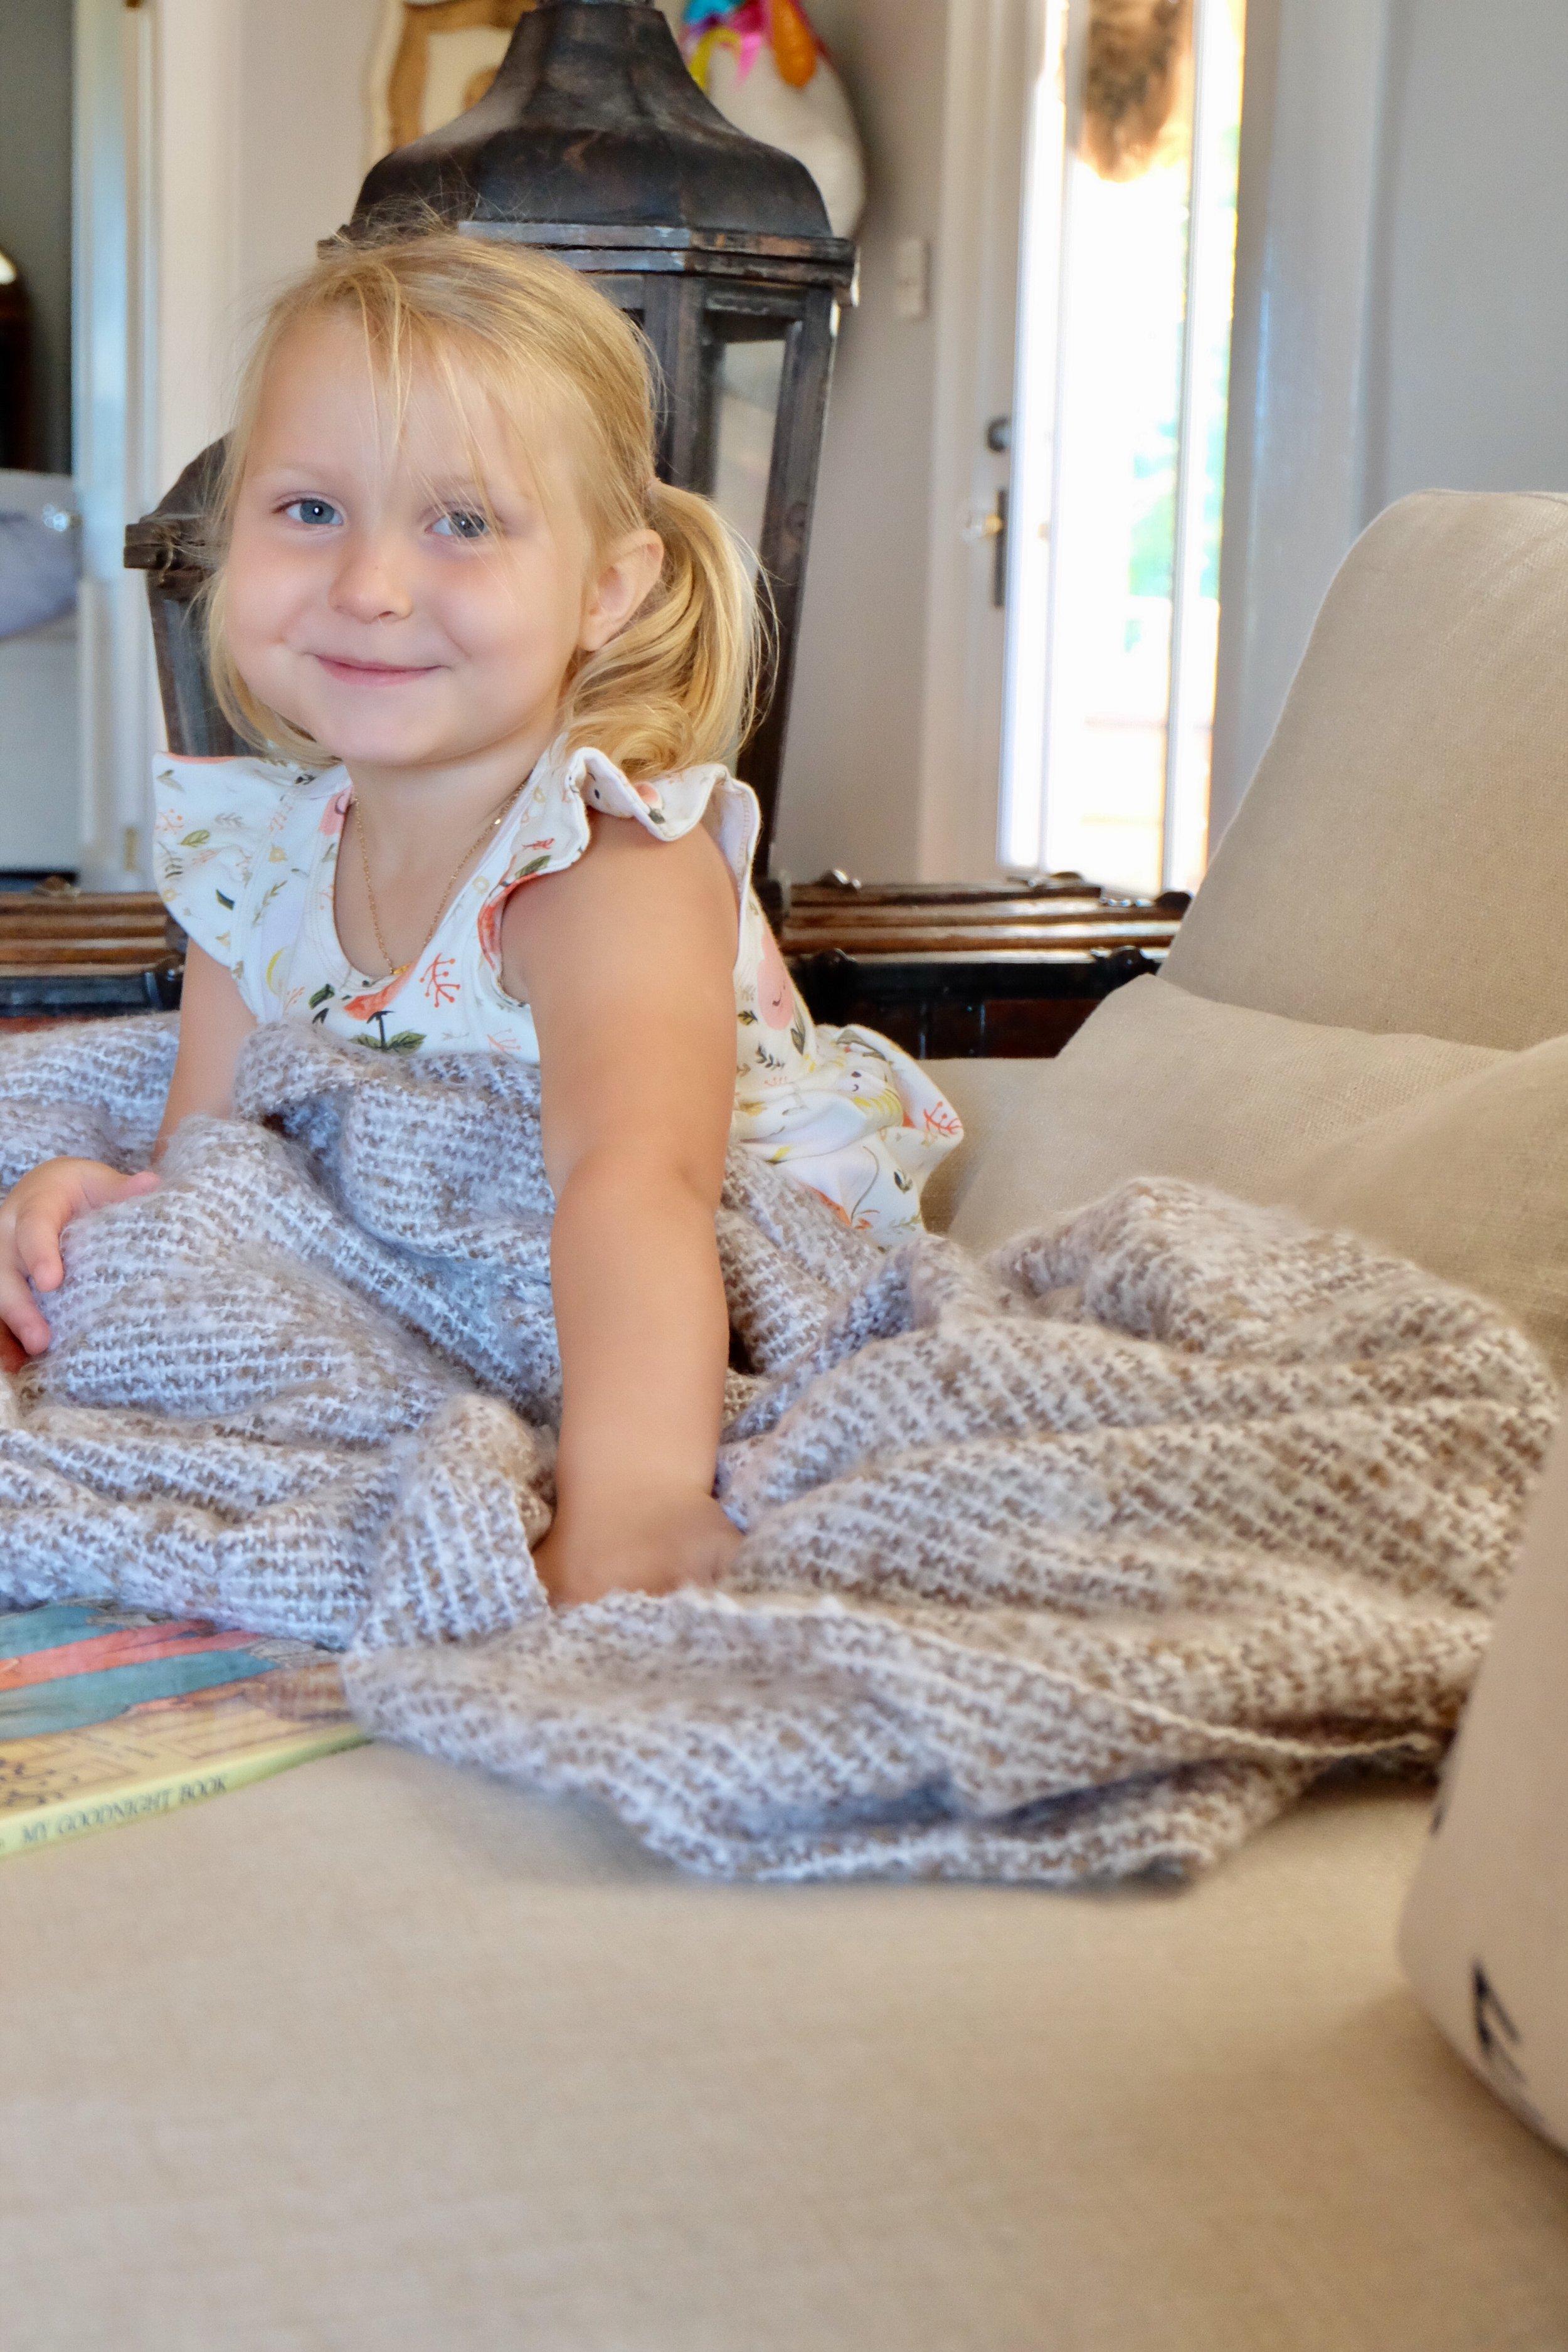 Harper found her new favorite reading spot! ;)